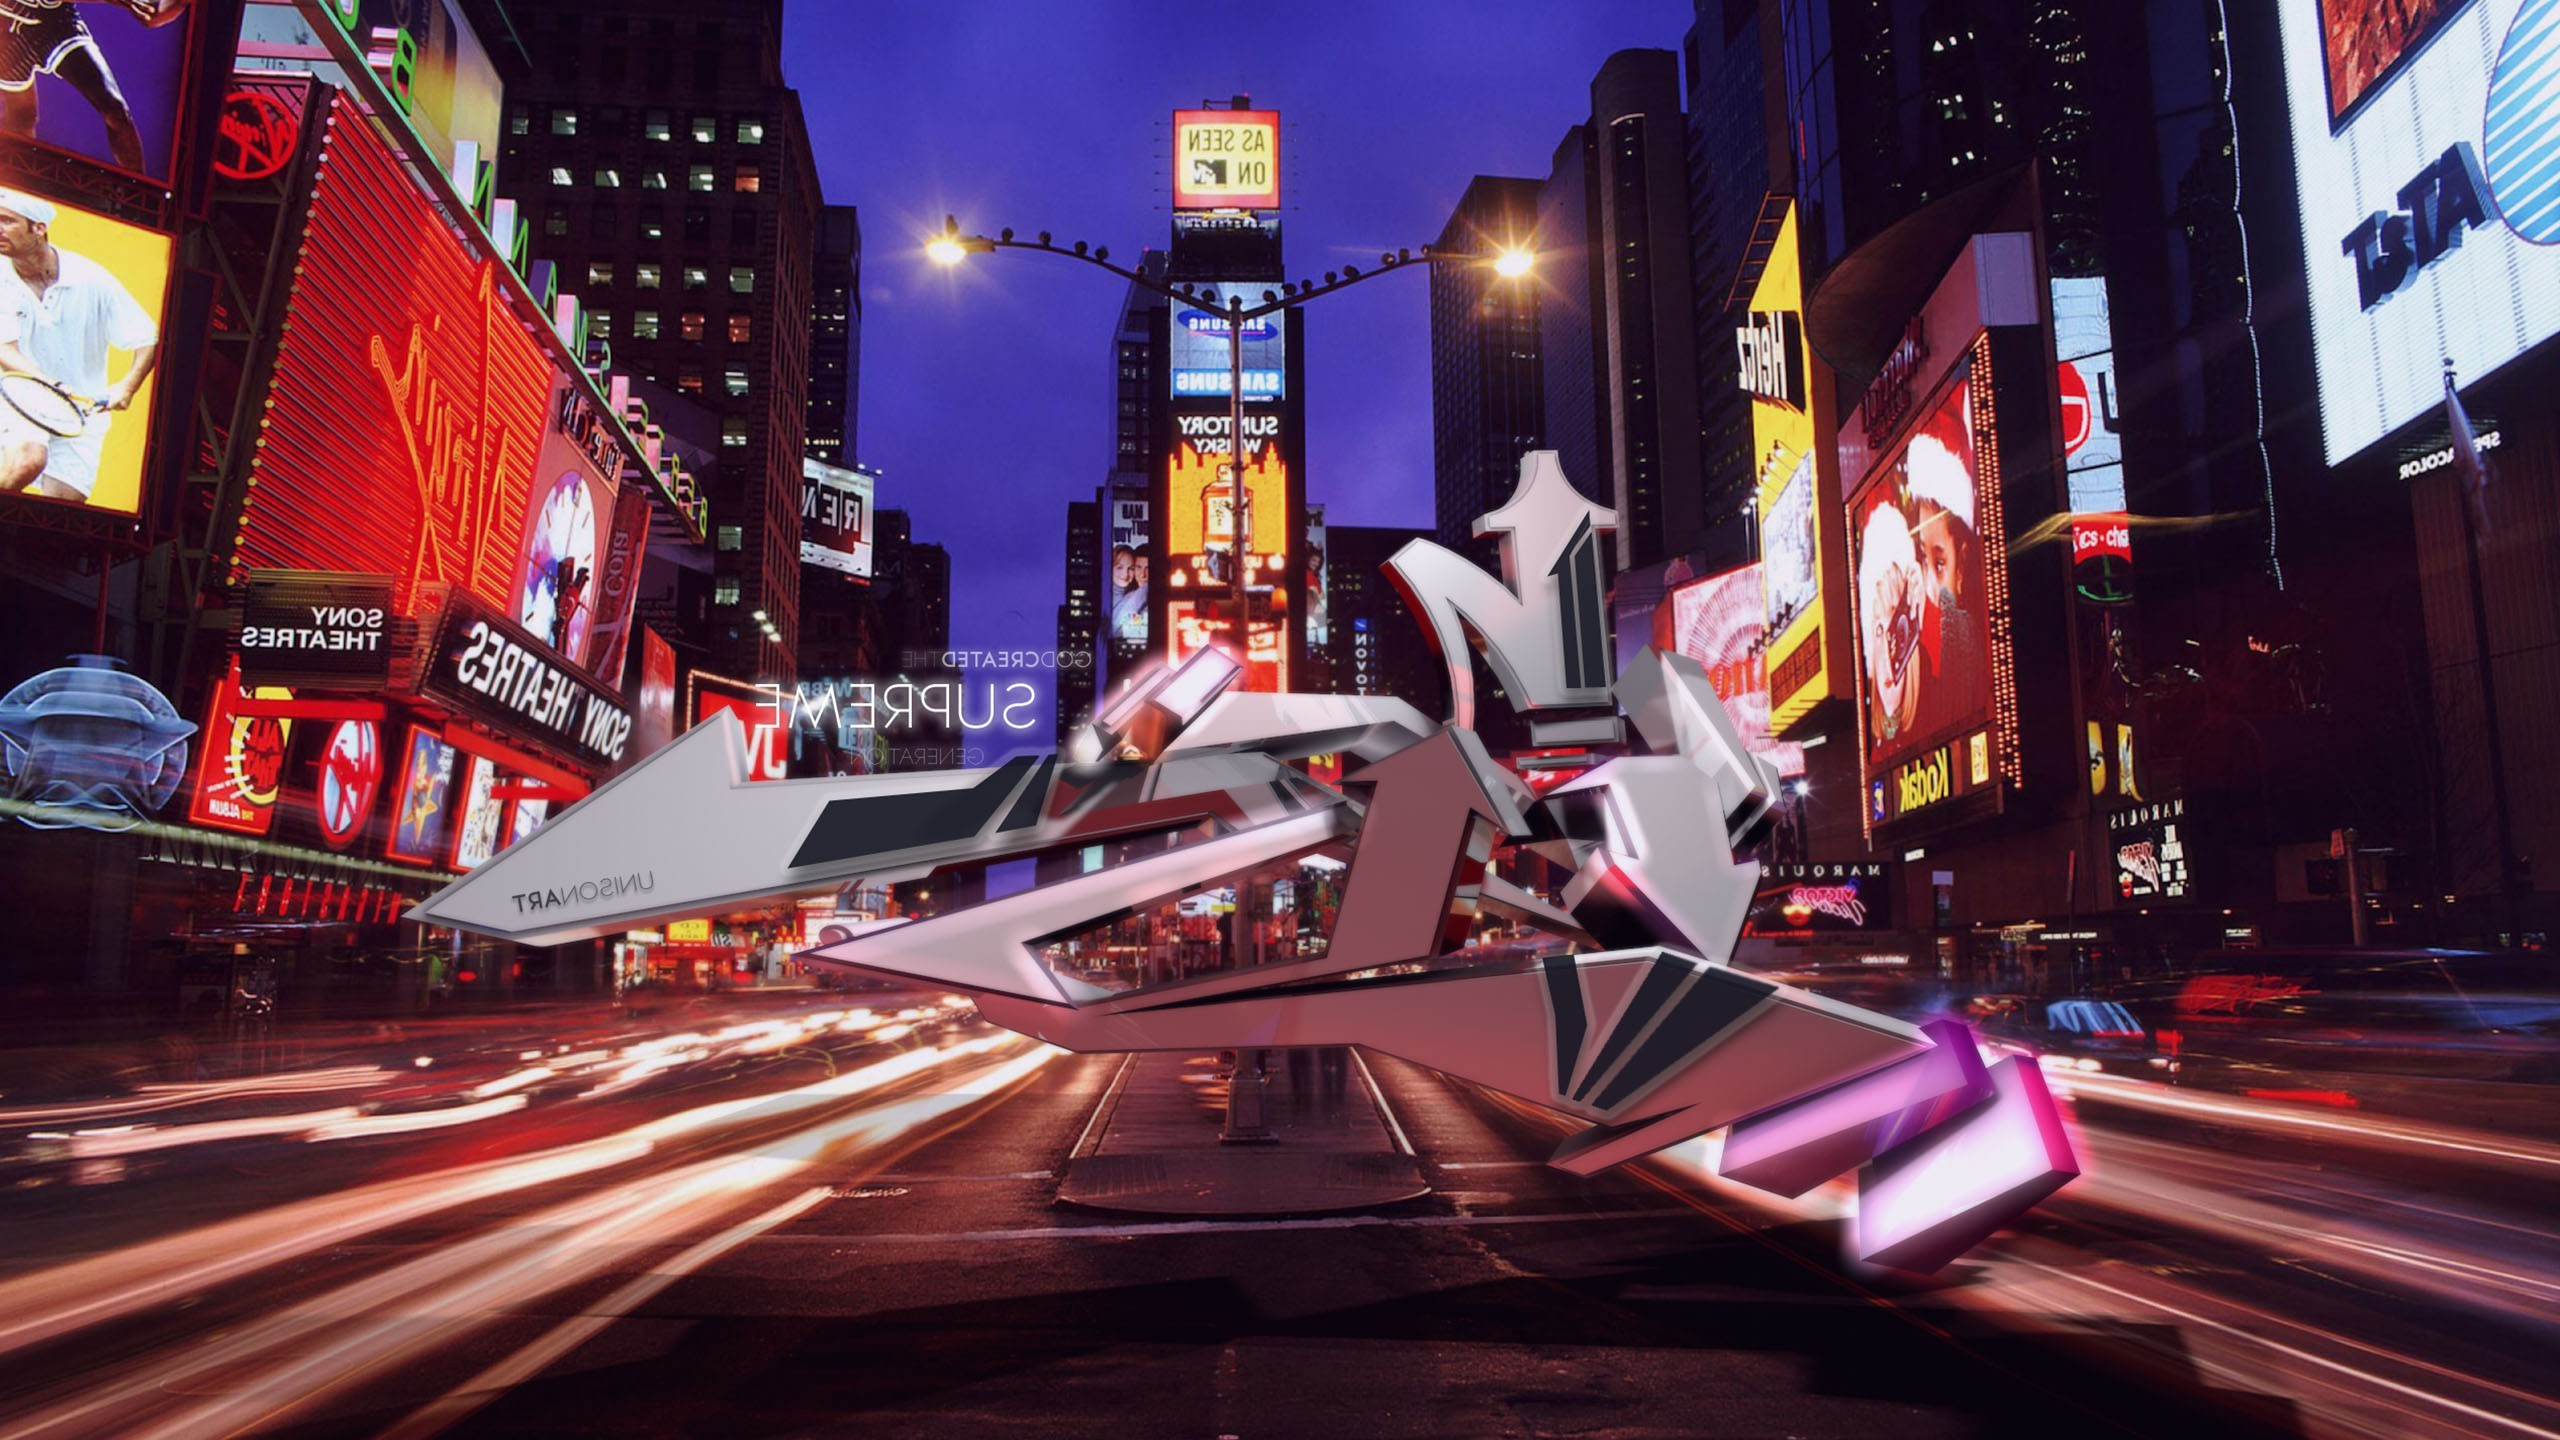 abstract, Graffiti, New York City, Times Square